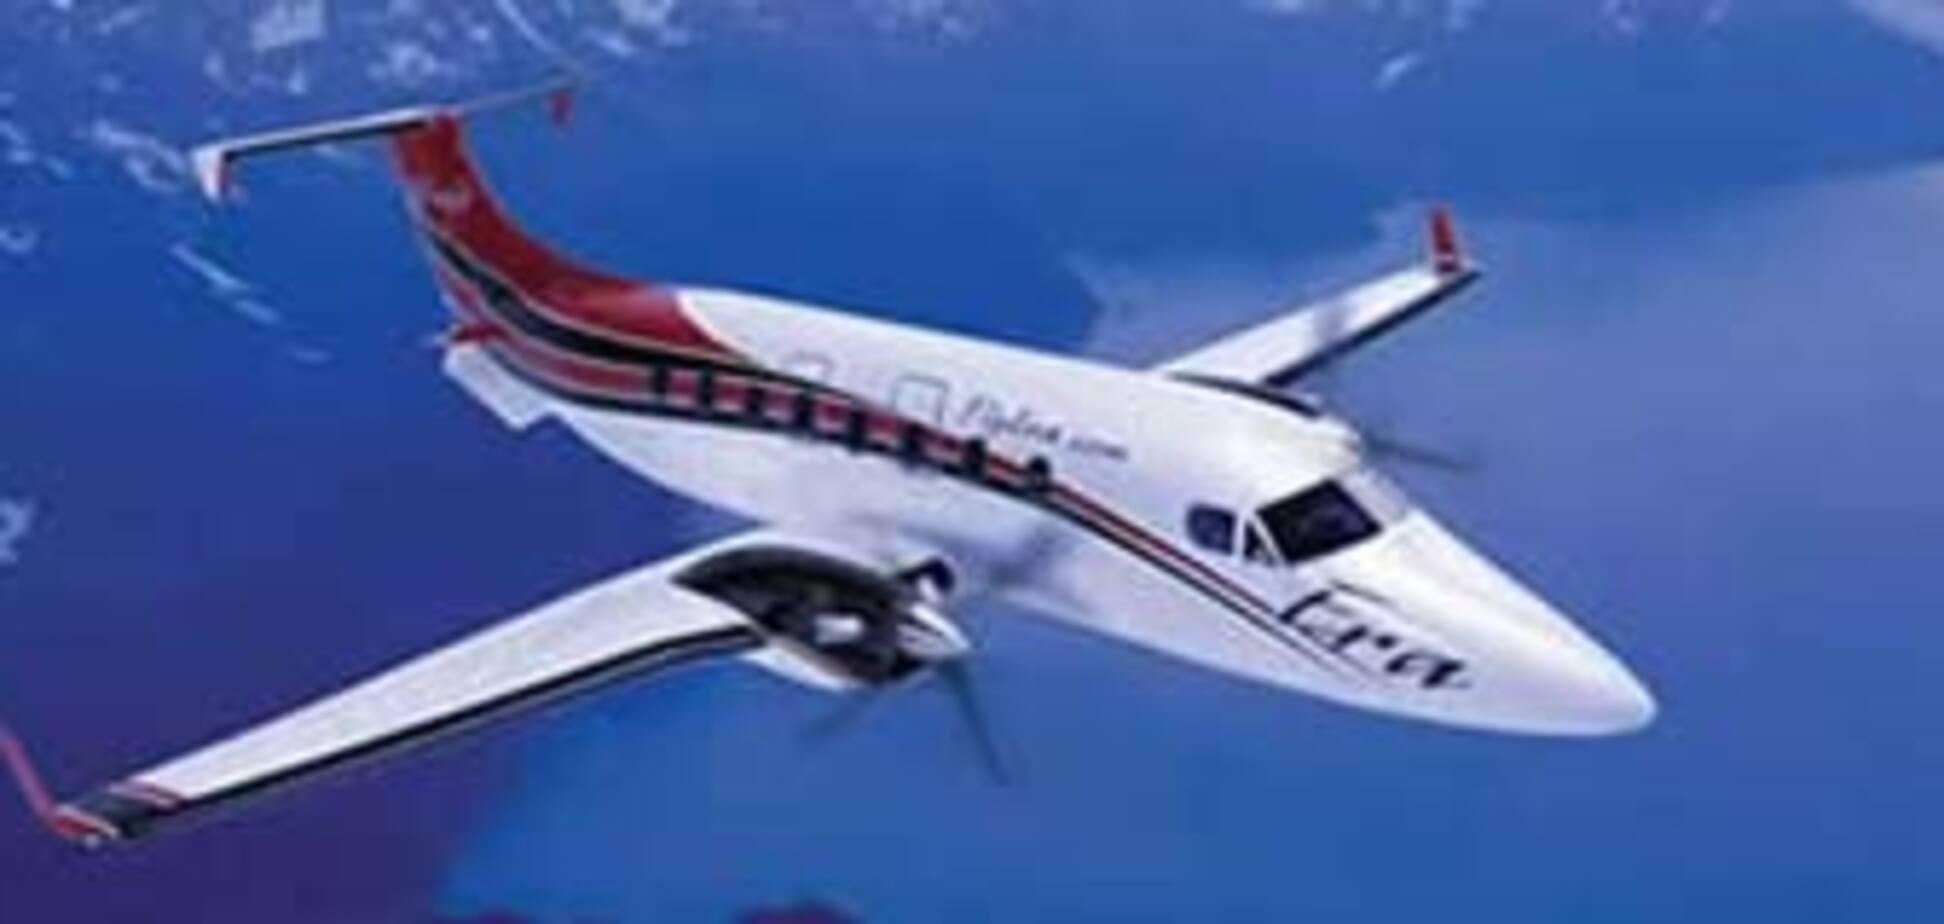 В Судане разбился самолет с 24 пассажирами на борту